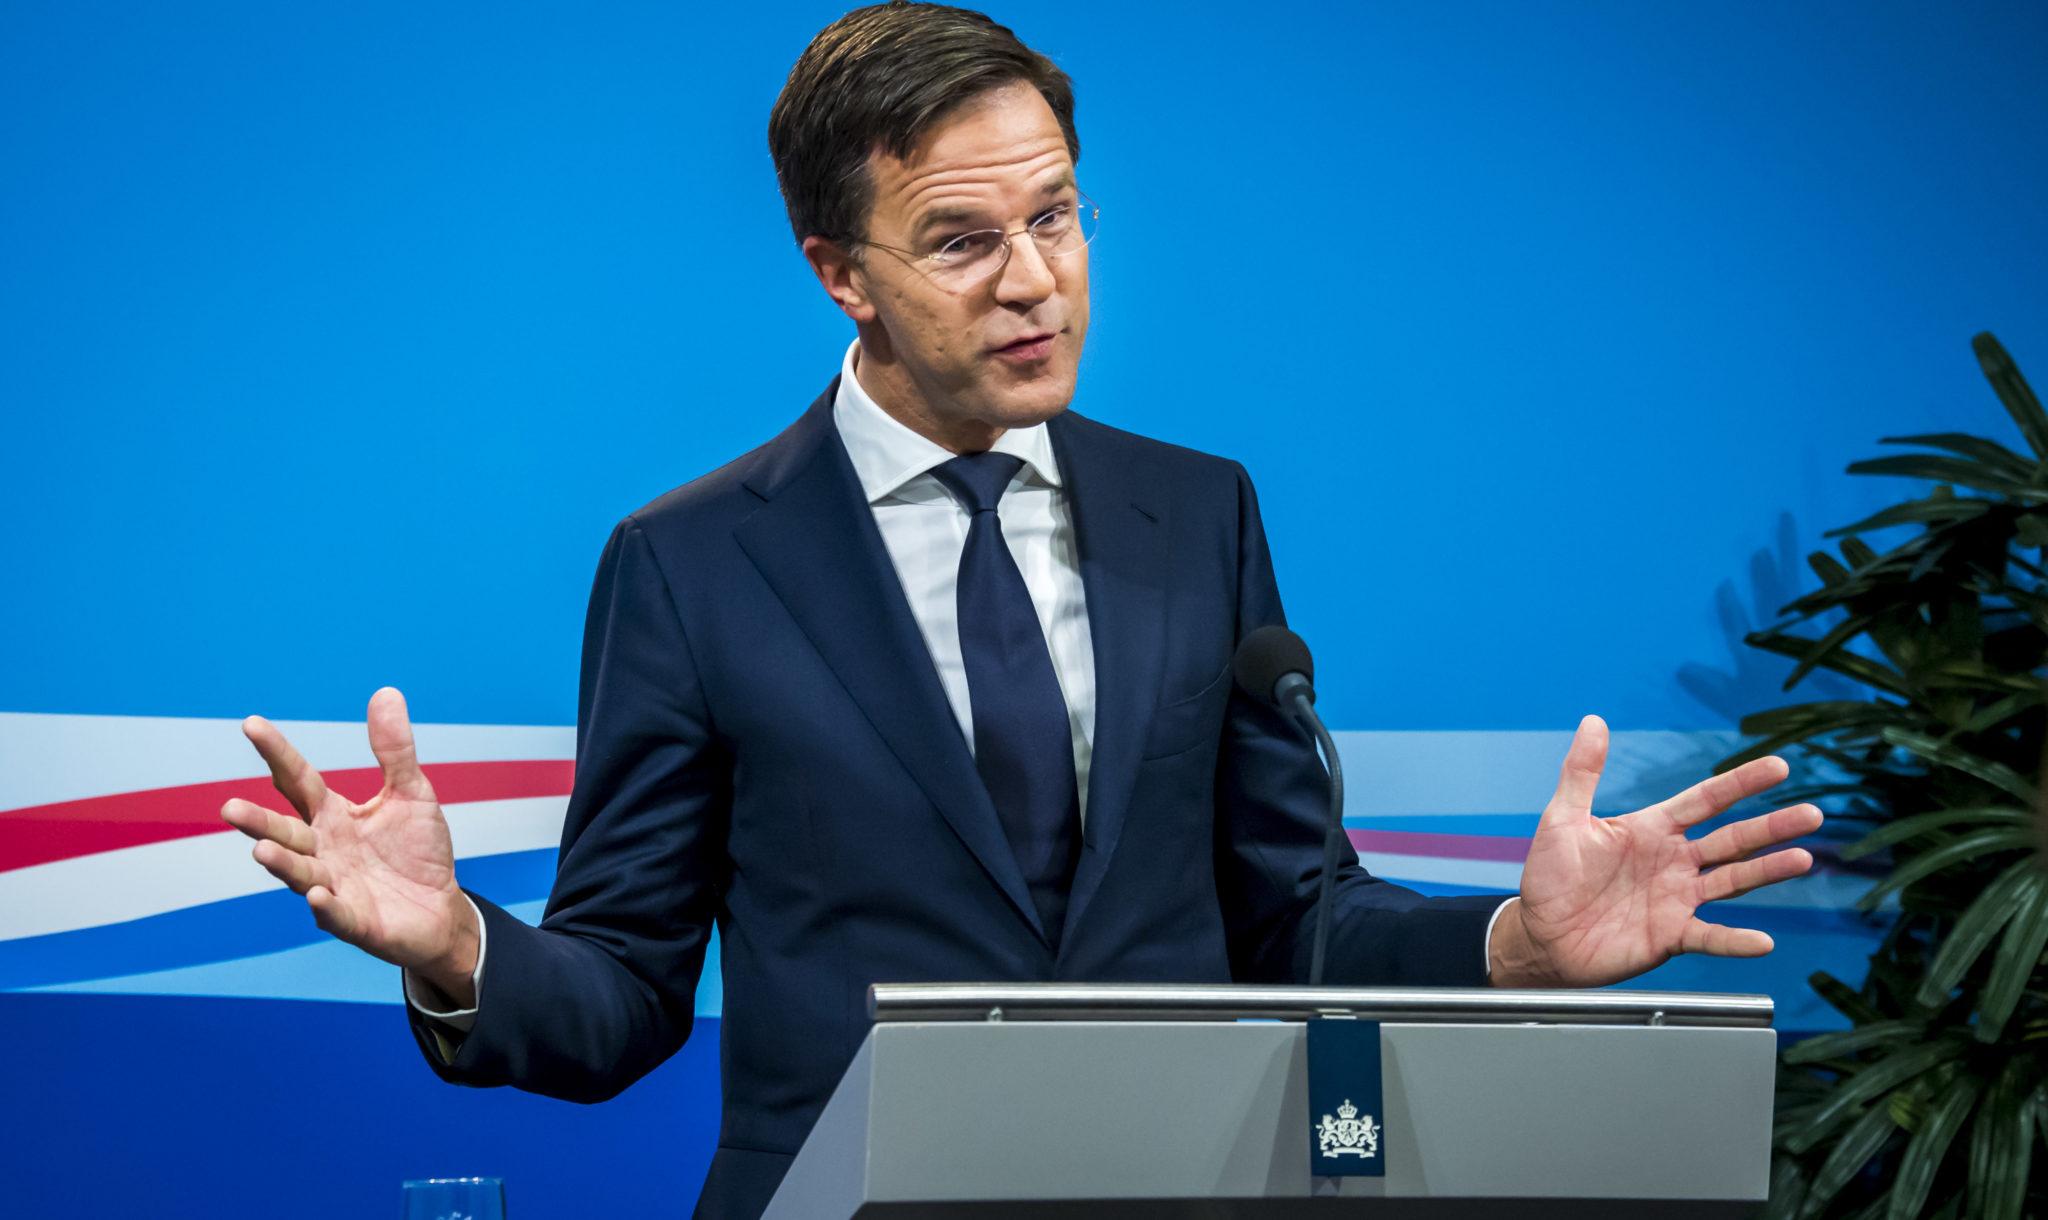 Na De Ministerraad: Rutte's PR-momentje Met Kurz